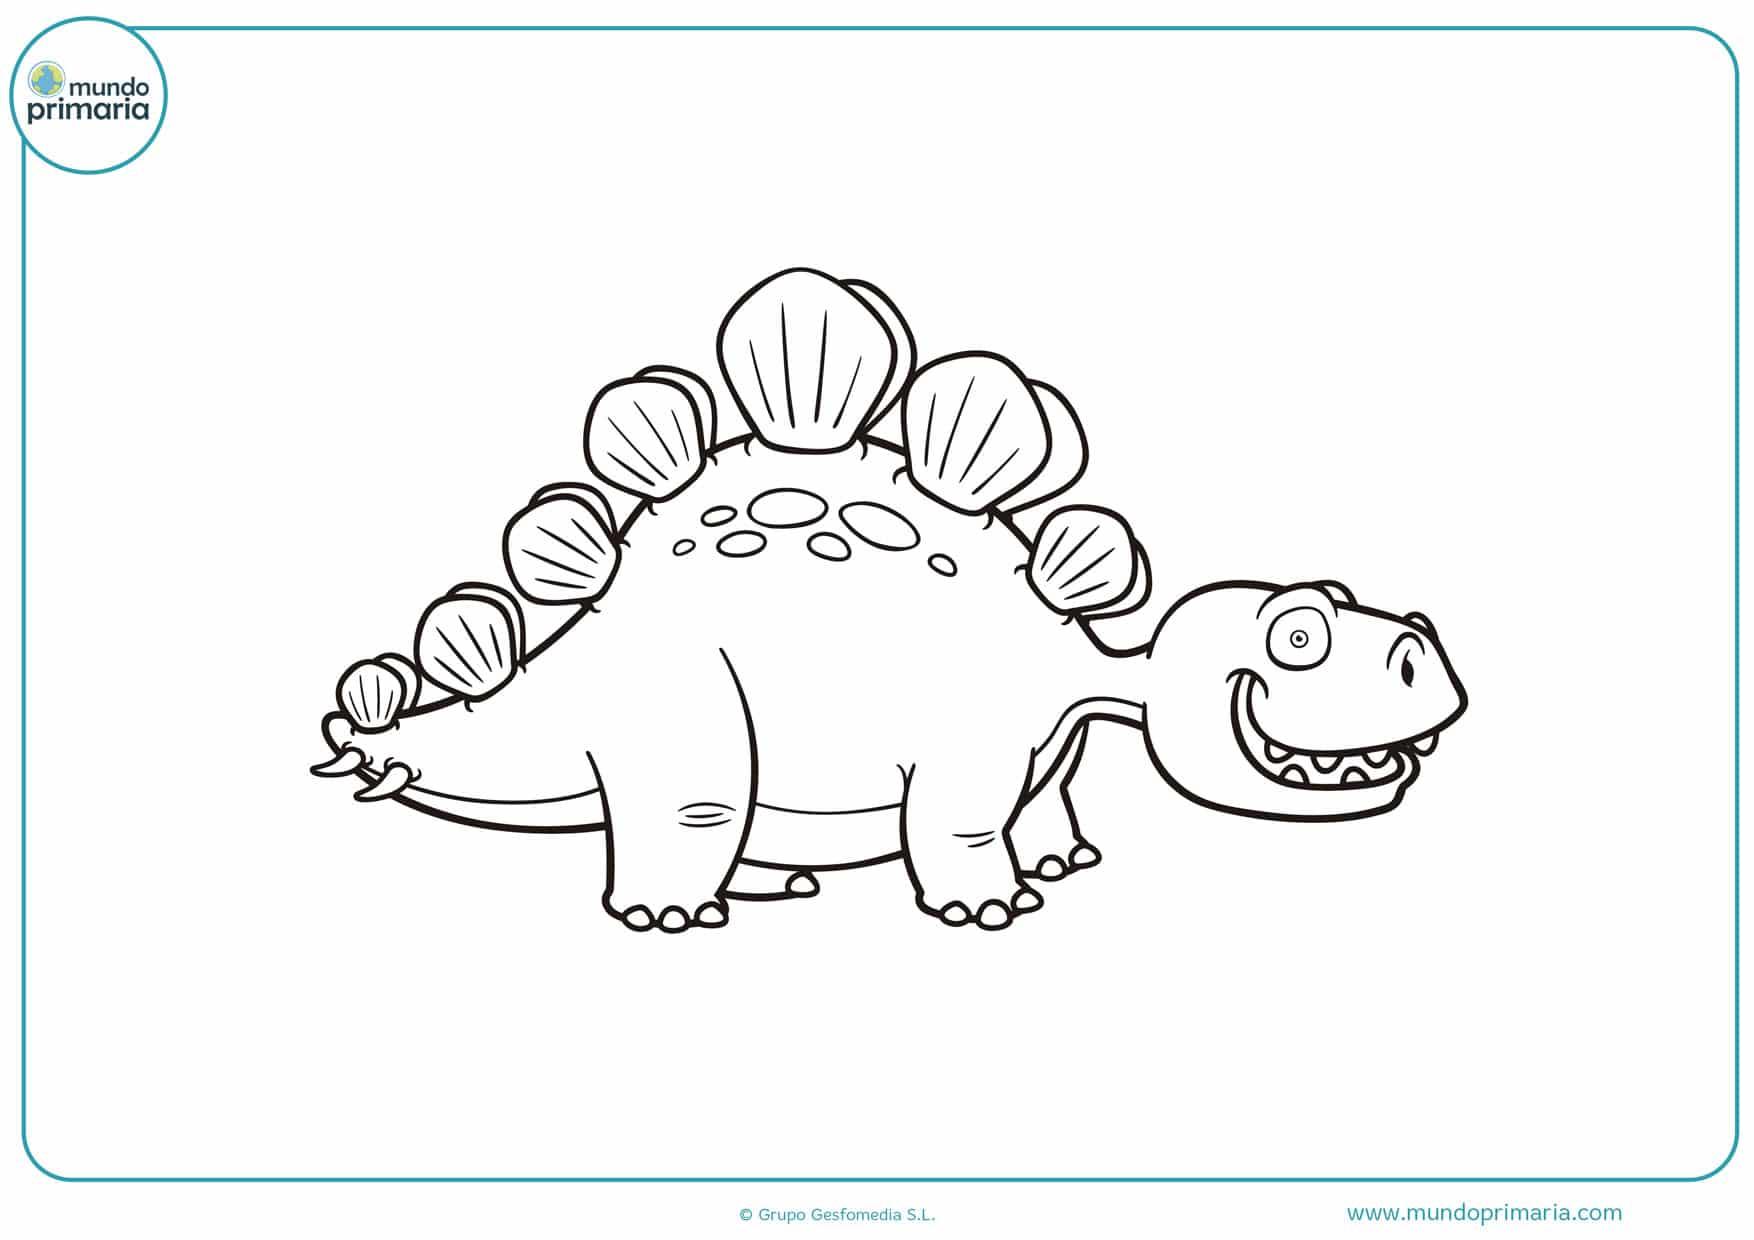 dibujos para colorear gratis de dinosaurios